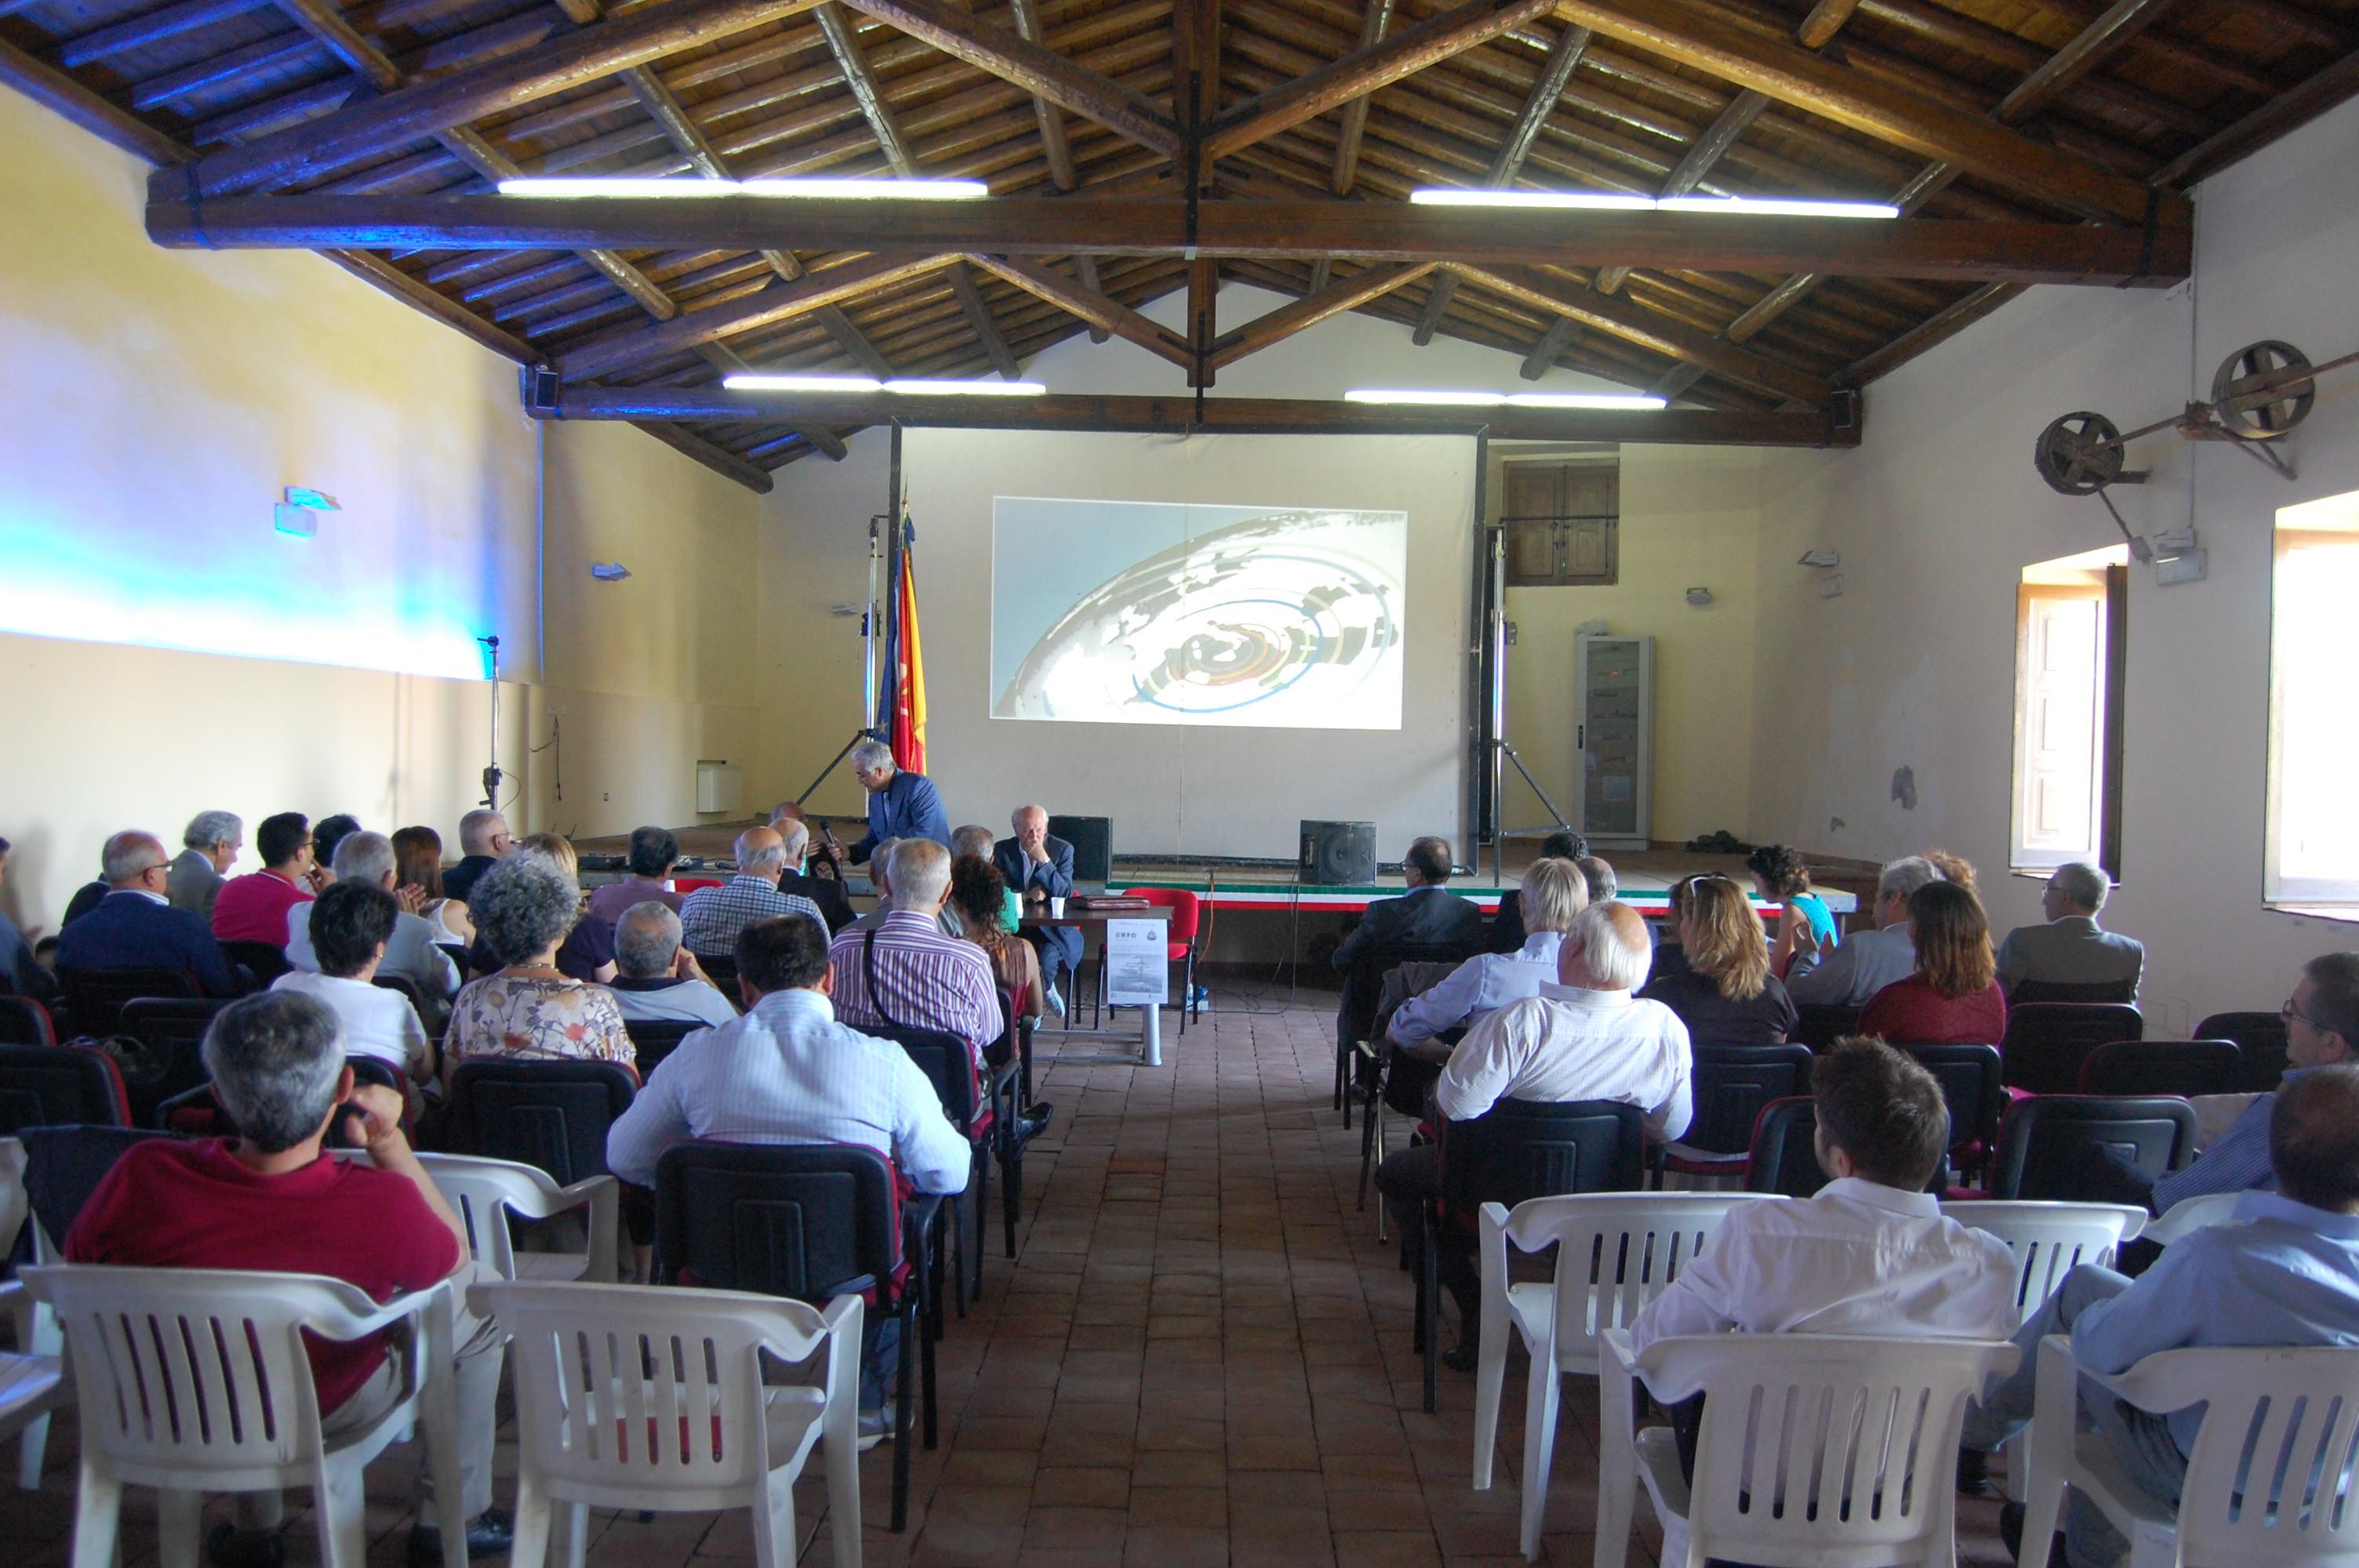 Conferenza Expo 2015 Ragalna